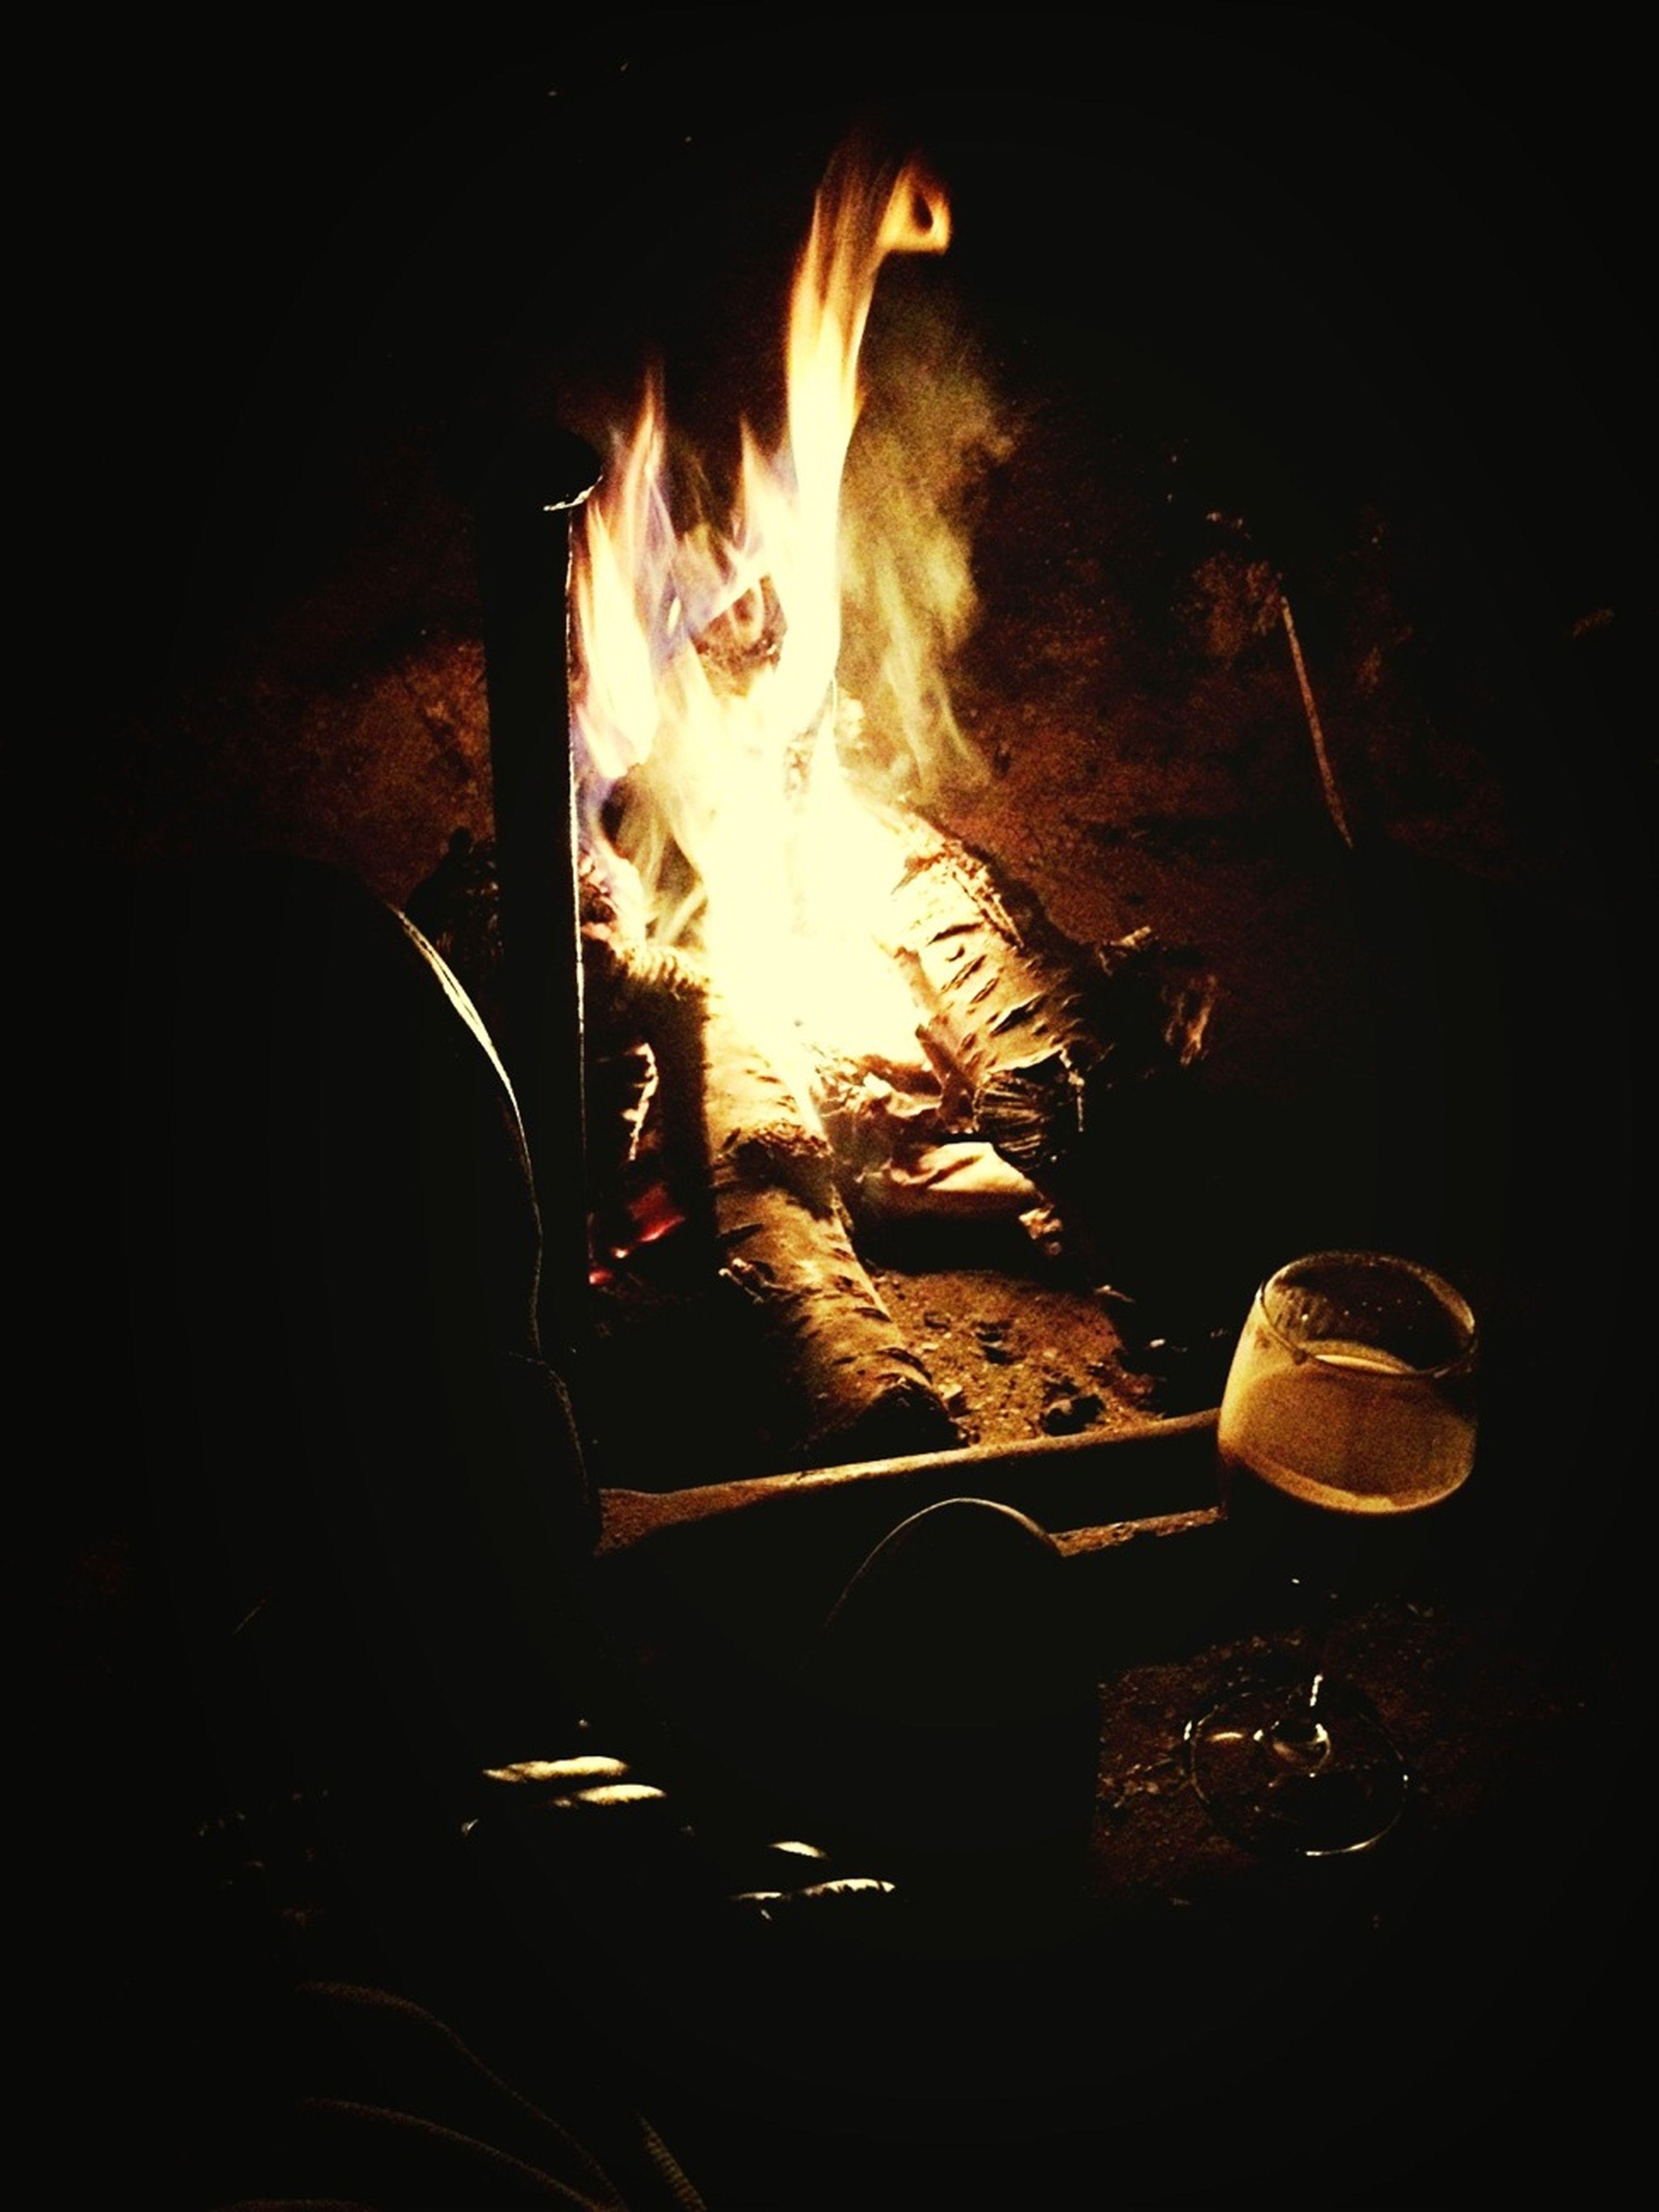 flame, burning, fire - natural phenomenon, heat - temperature, night, glowing, fire, indoors, bonfire, dark, illuminated, firewood, heat, candle, close-up, fireplace, light - natural phenomenon, campfire, wood - material, lit